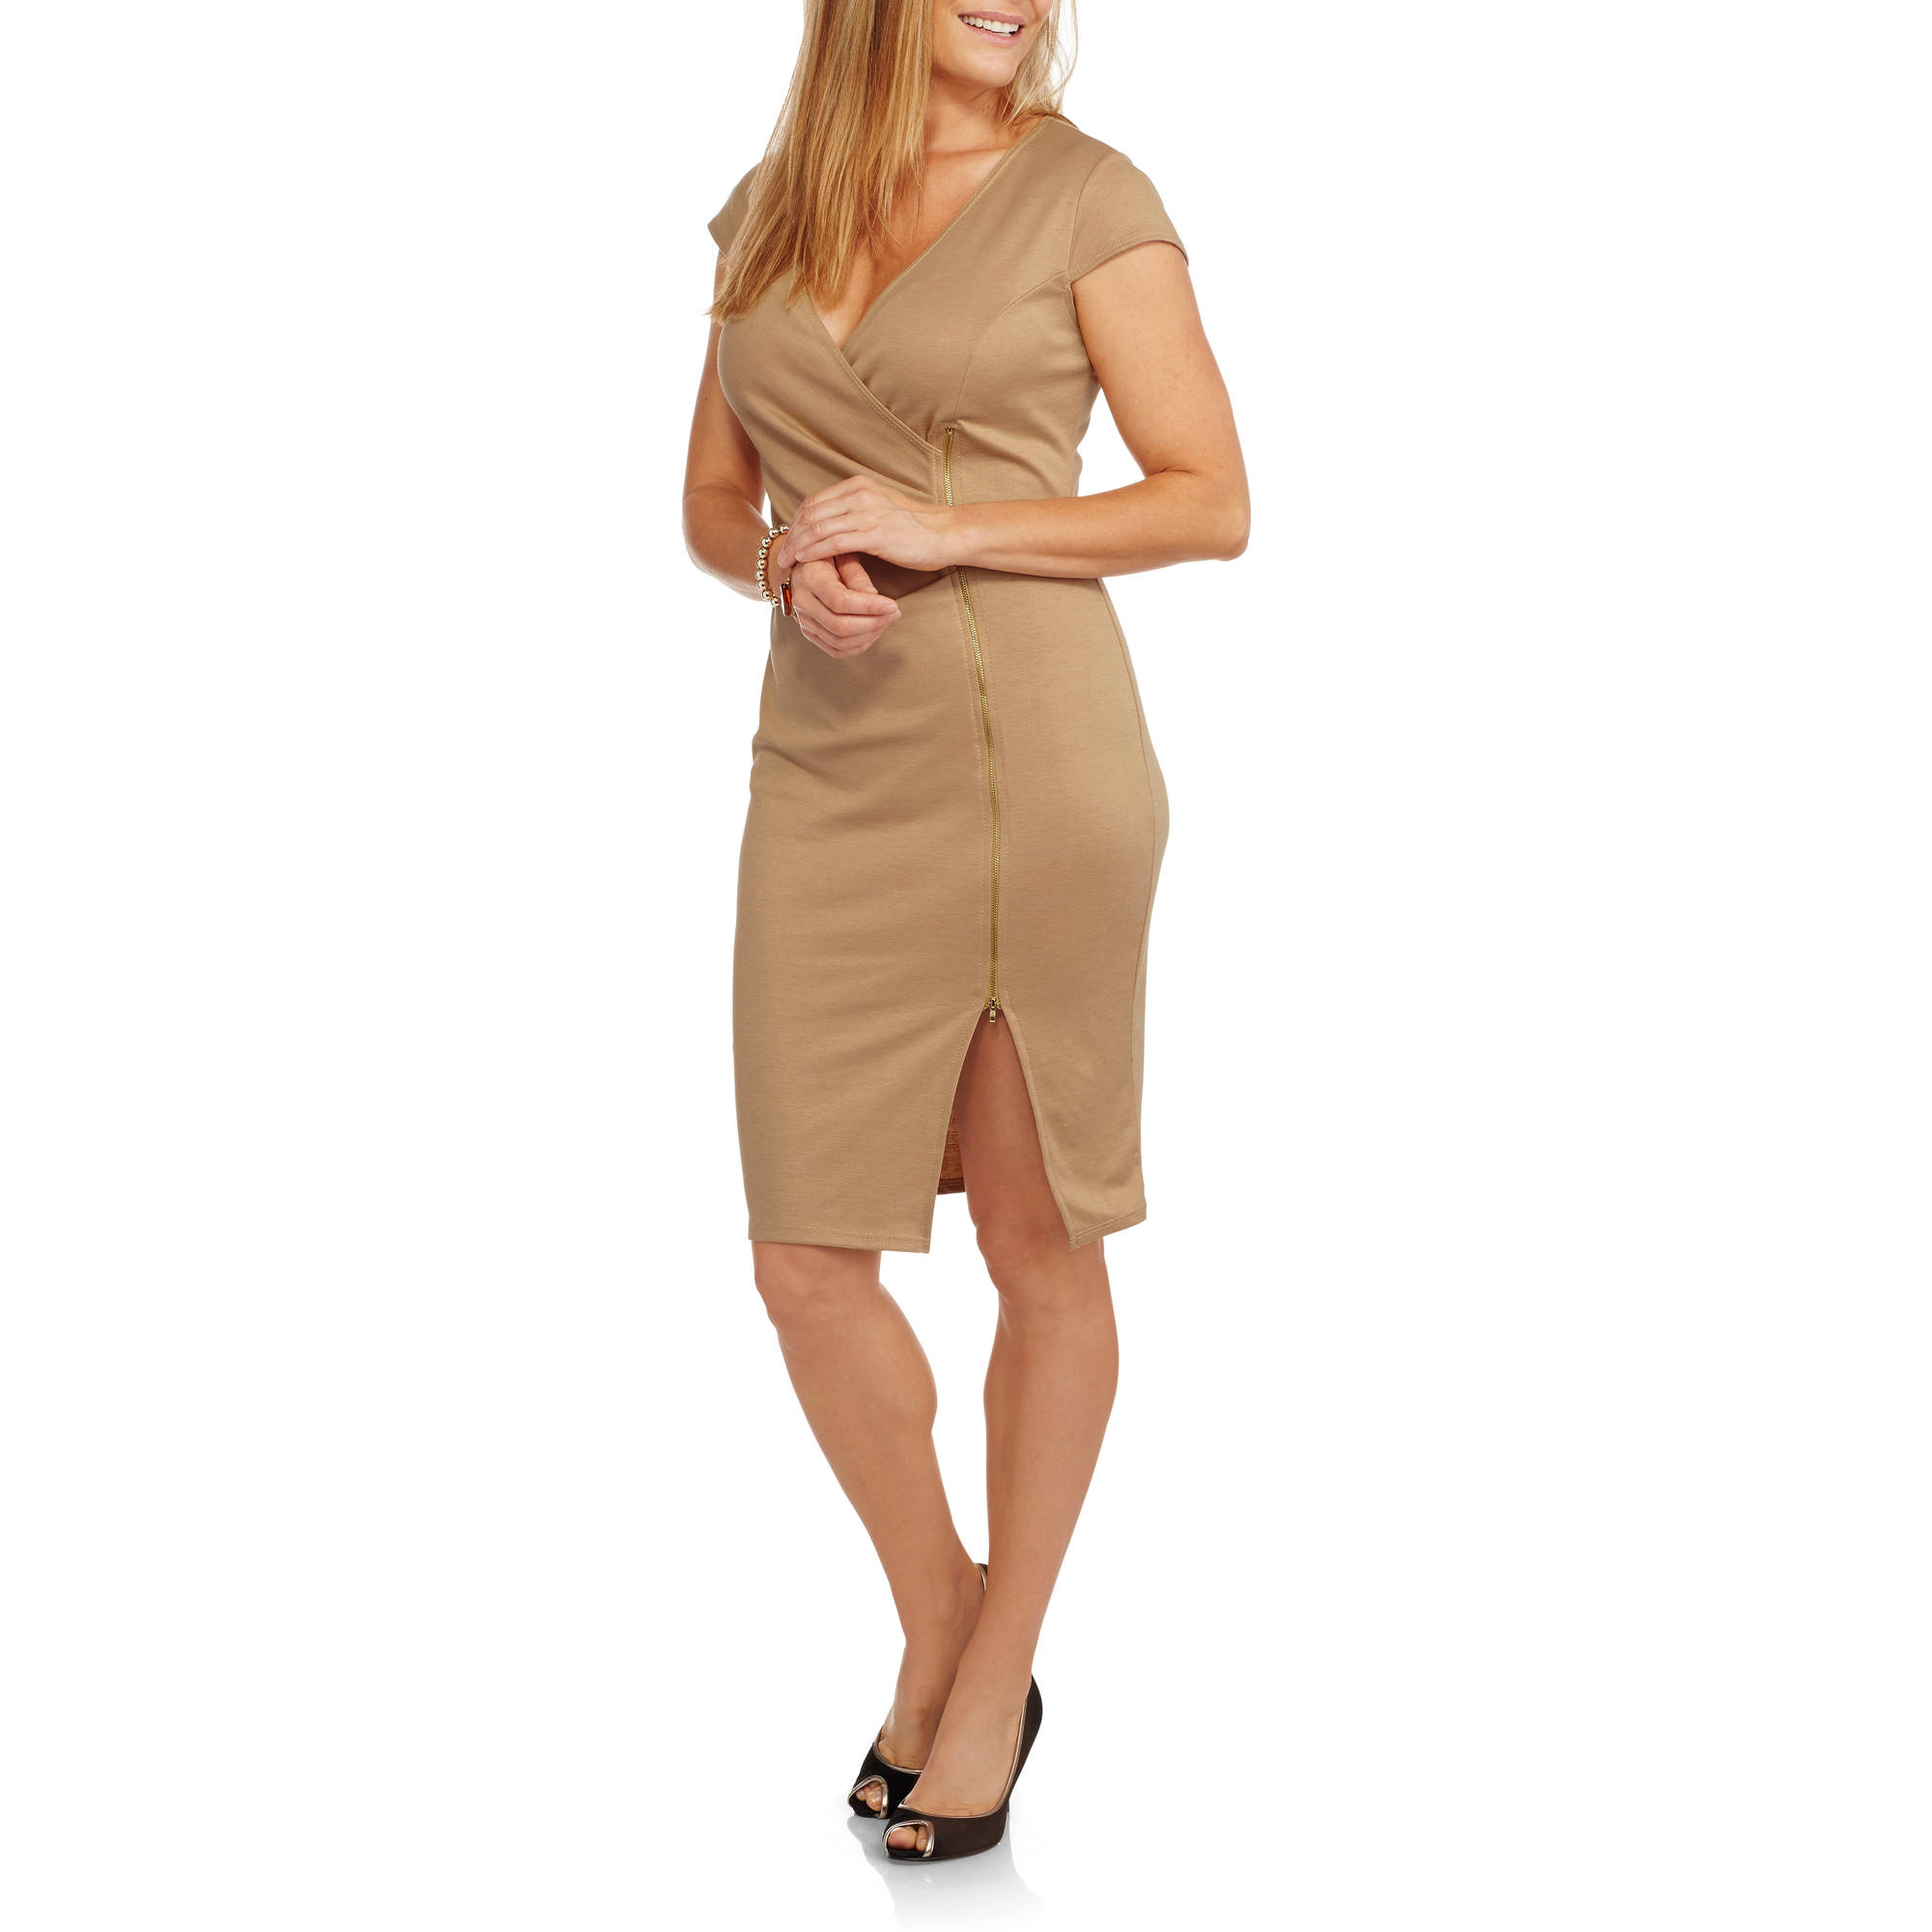 9th Street Apparel Women's Zipper Front Wrap Dress